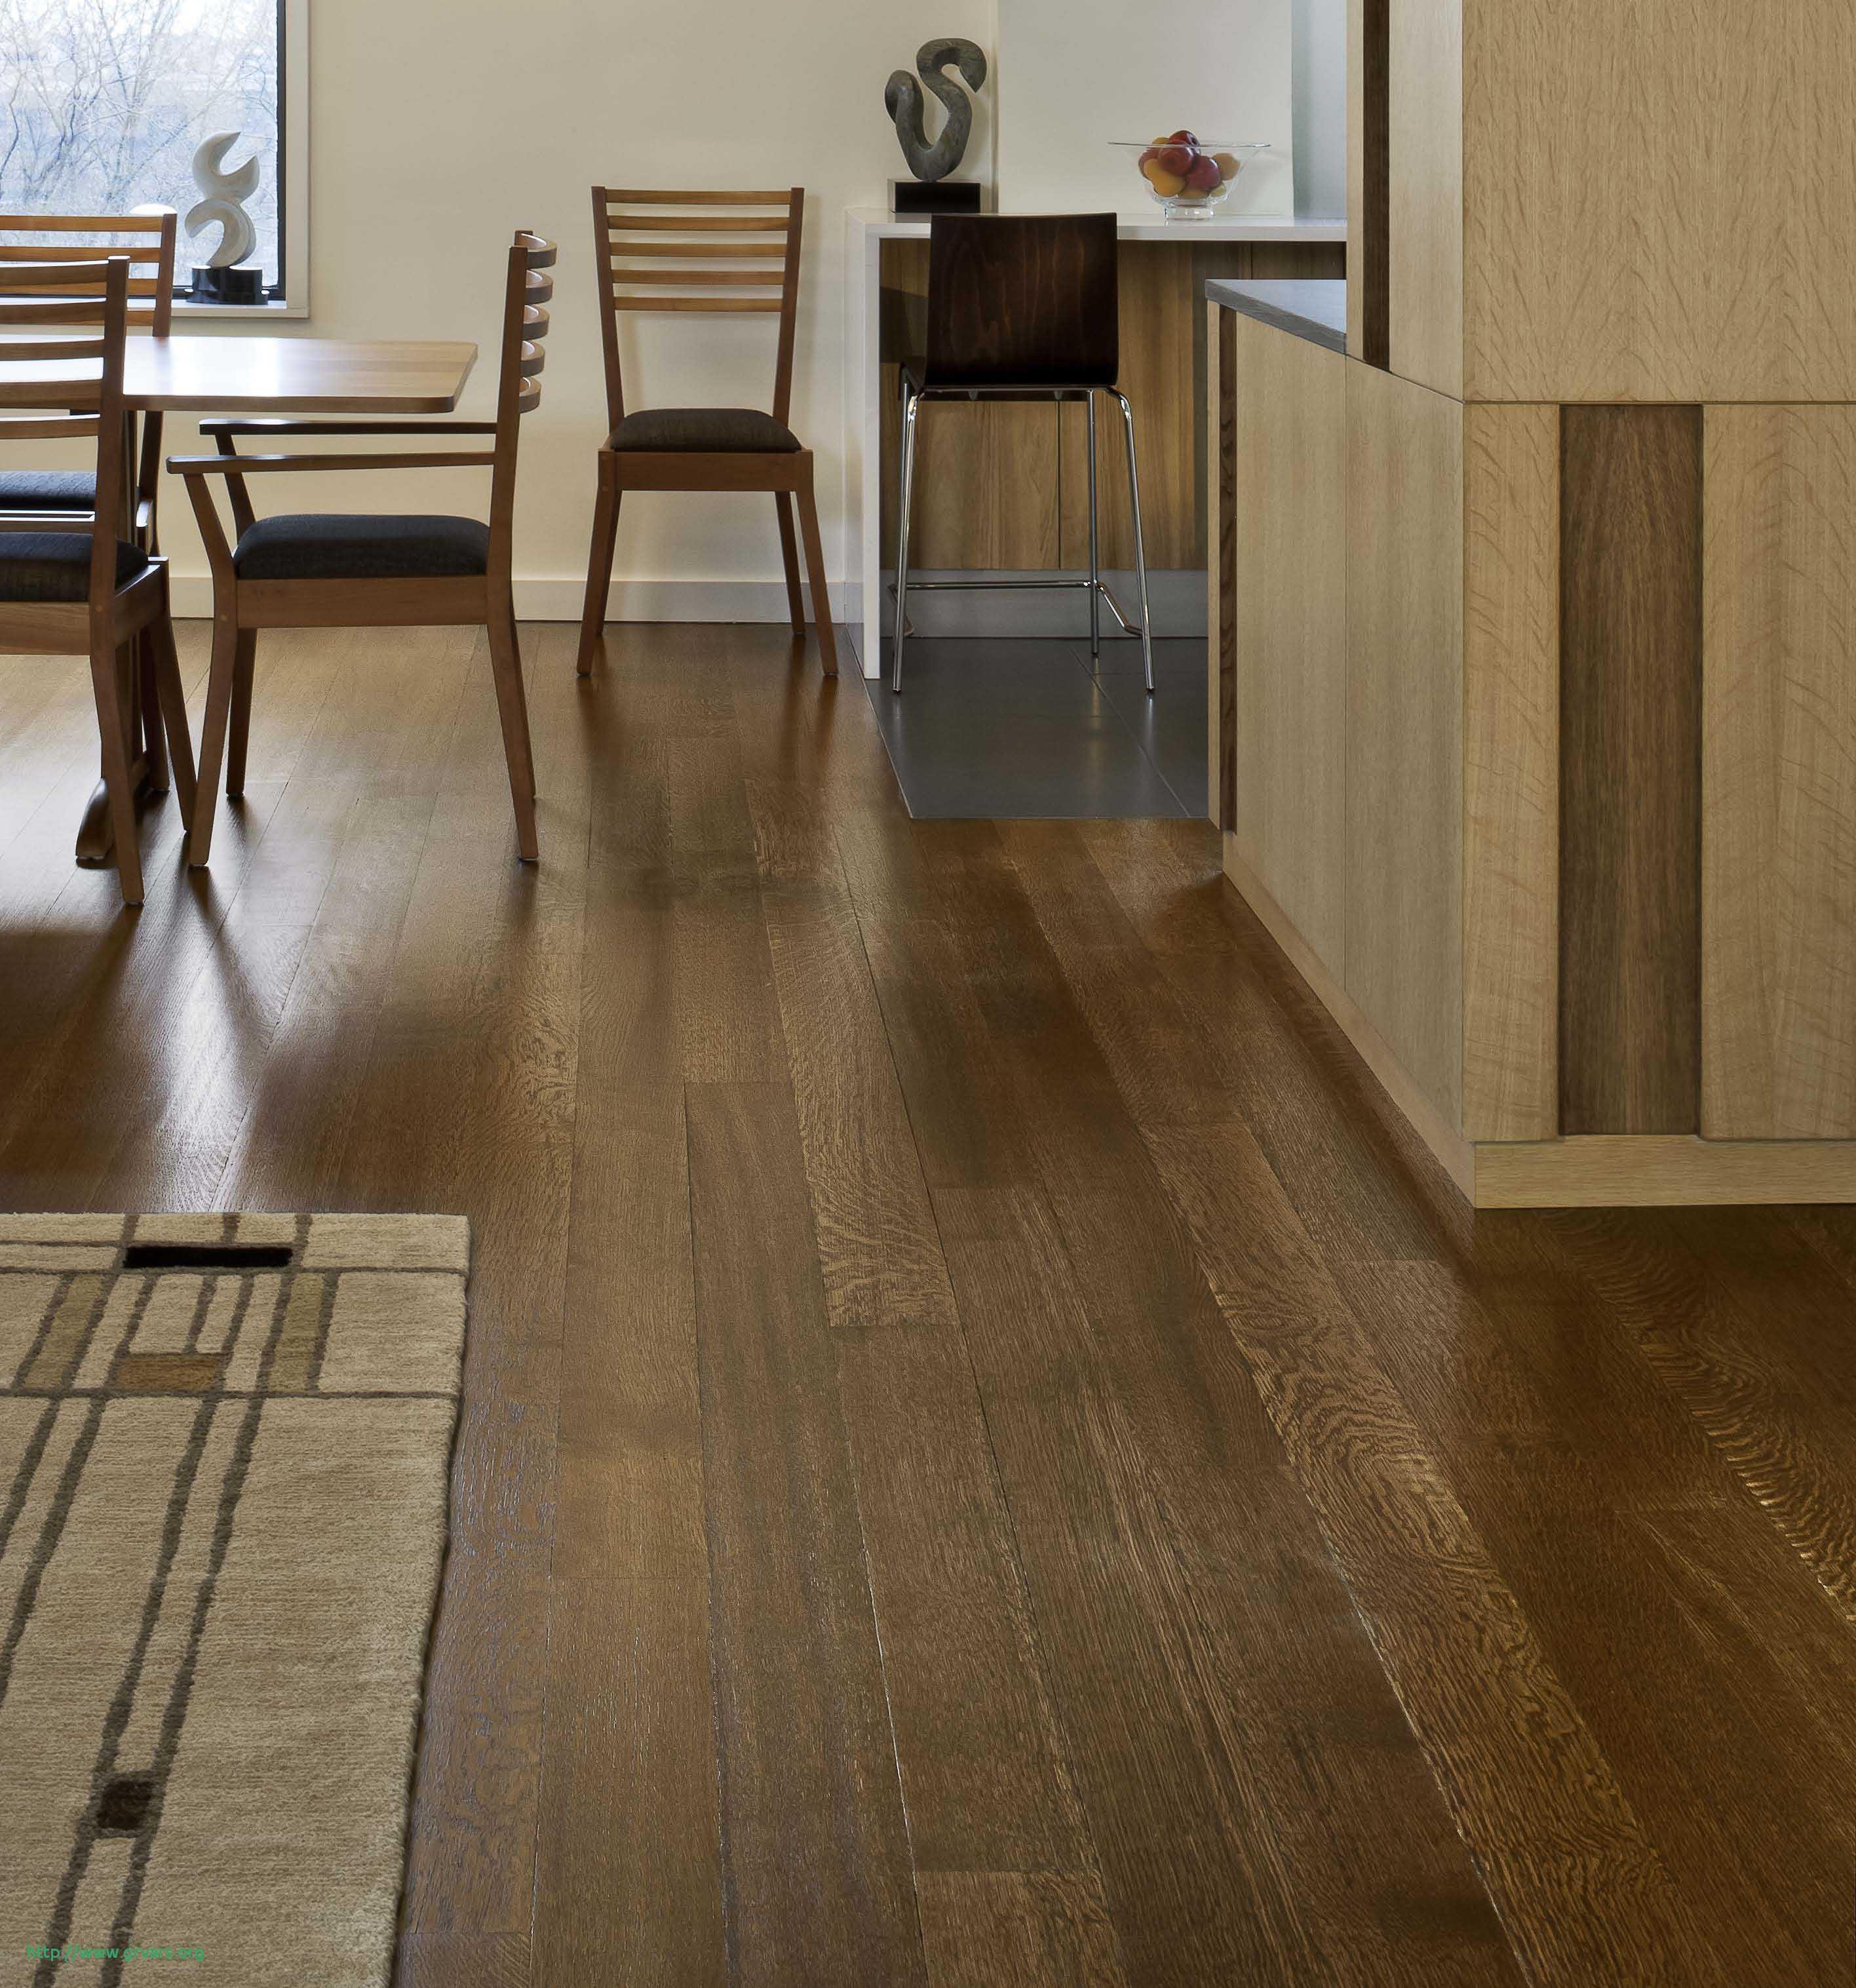 hardwood flooring nashville of hardwood flooring deals 24 alagant buy floors direct nashville with hardwood flooring deals 24 alagant buy floors direct nashville